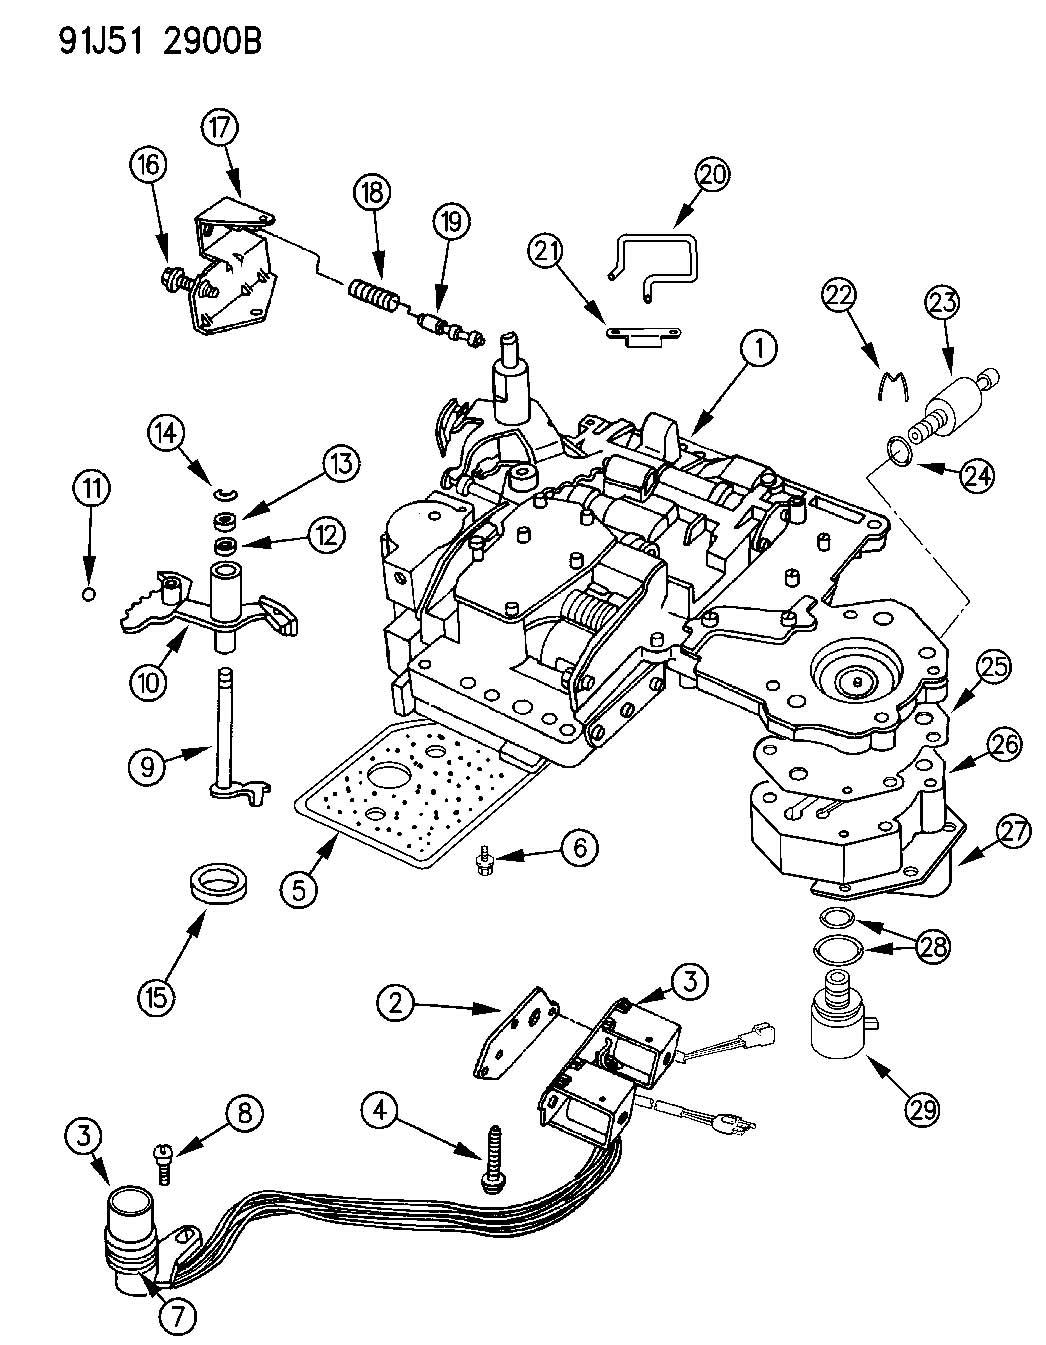 Diagram Willys Jeep Transmission Diagram Full Version Hd Quality Transmission Diagram Diagrammaulej Beppecacopardo It